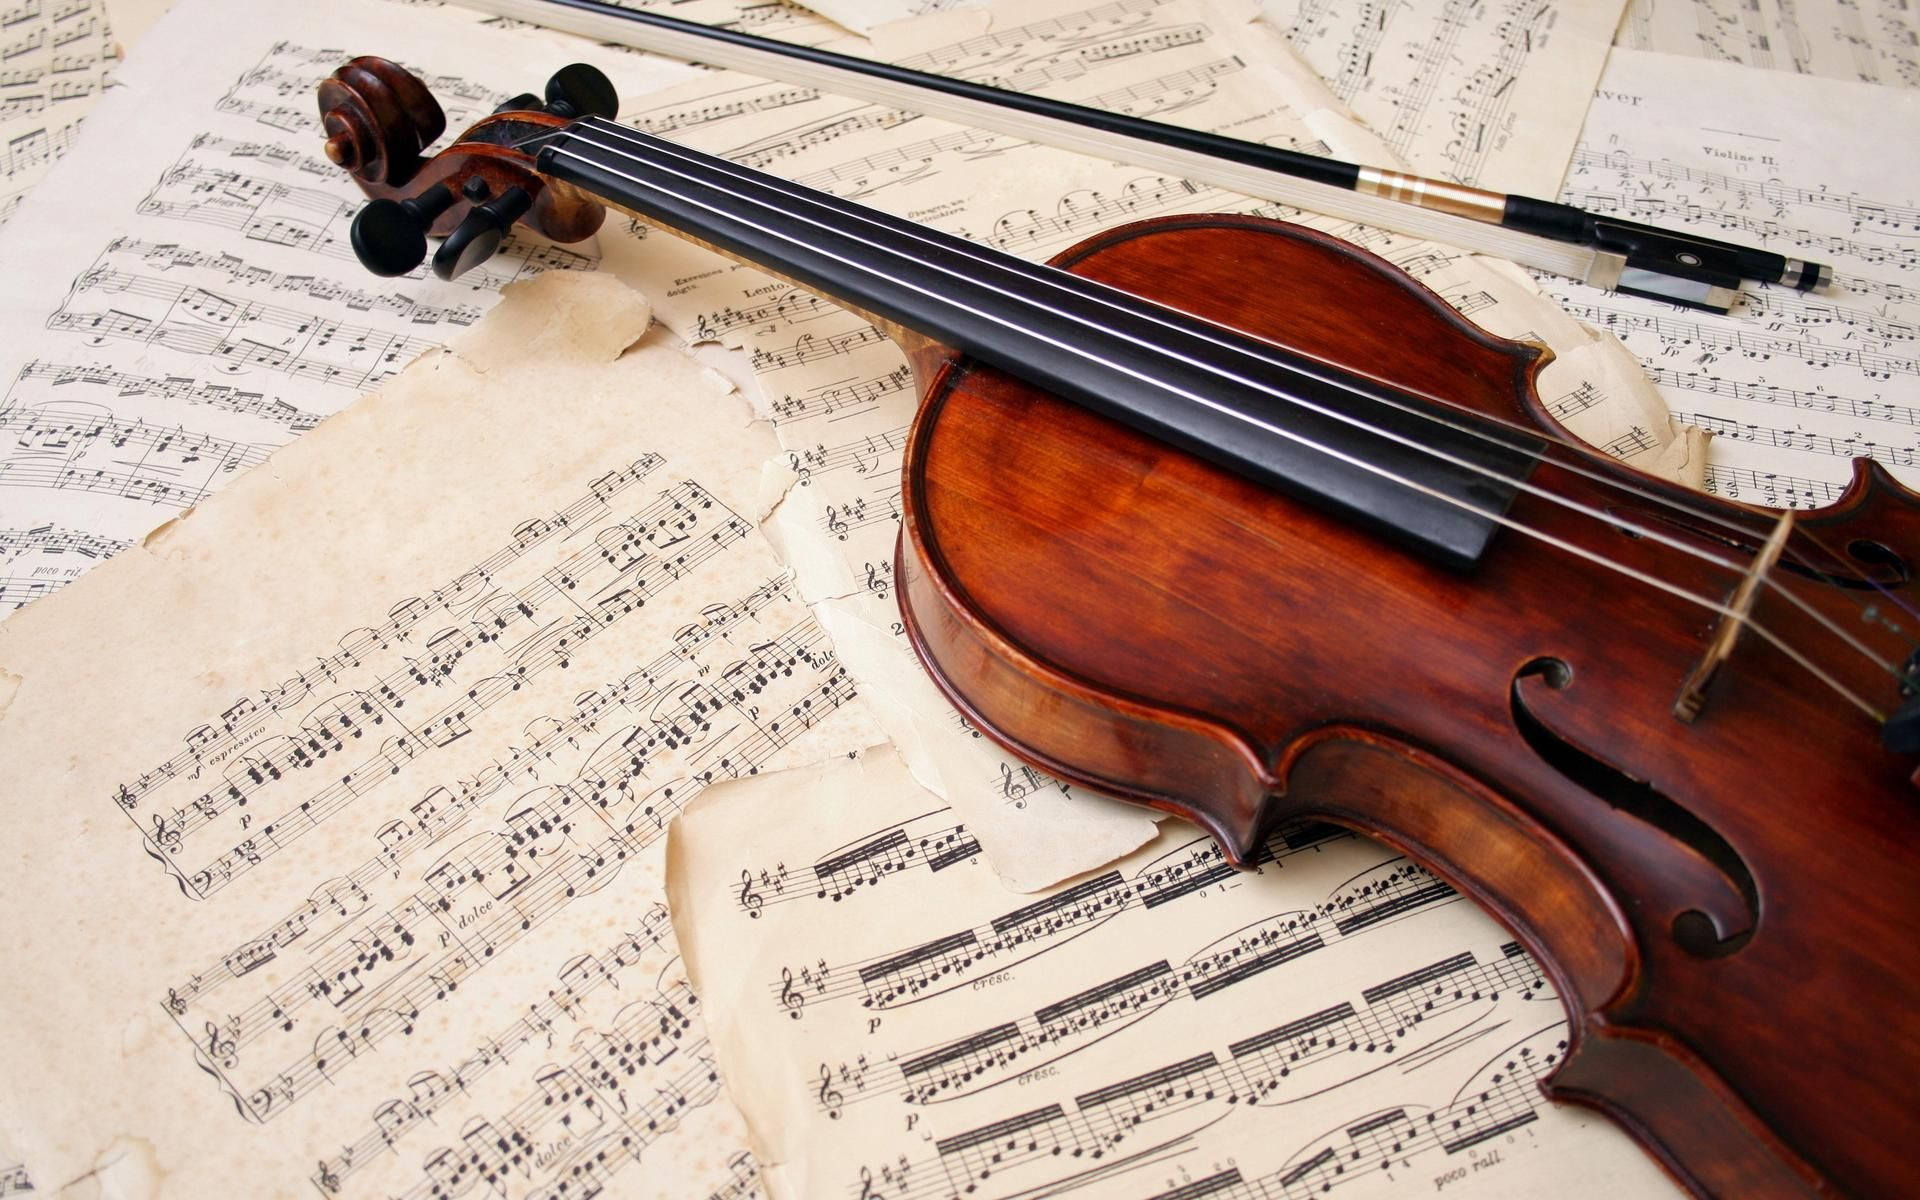 Violin Computer Wallpapers Desktop Backgrounds 2560x1600 Id 391320 Violin Sheet Music Violin Music Instruments